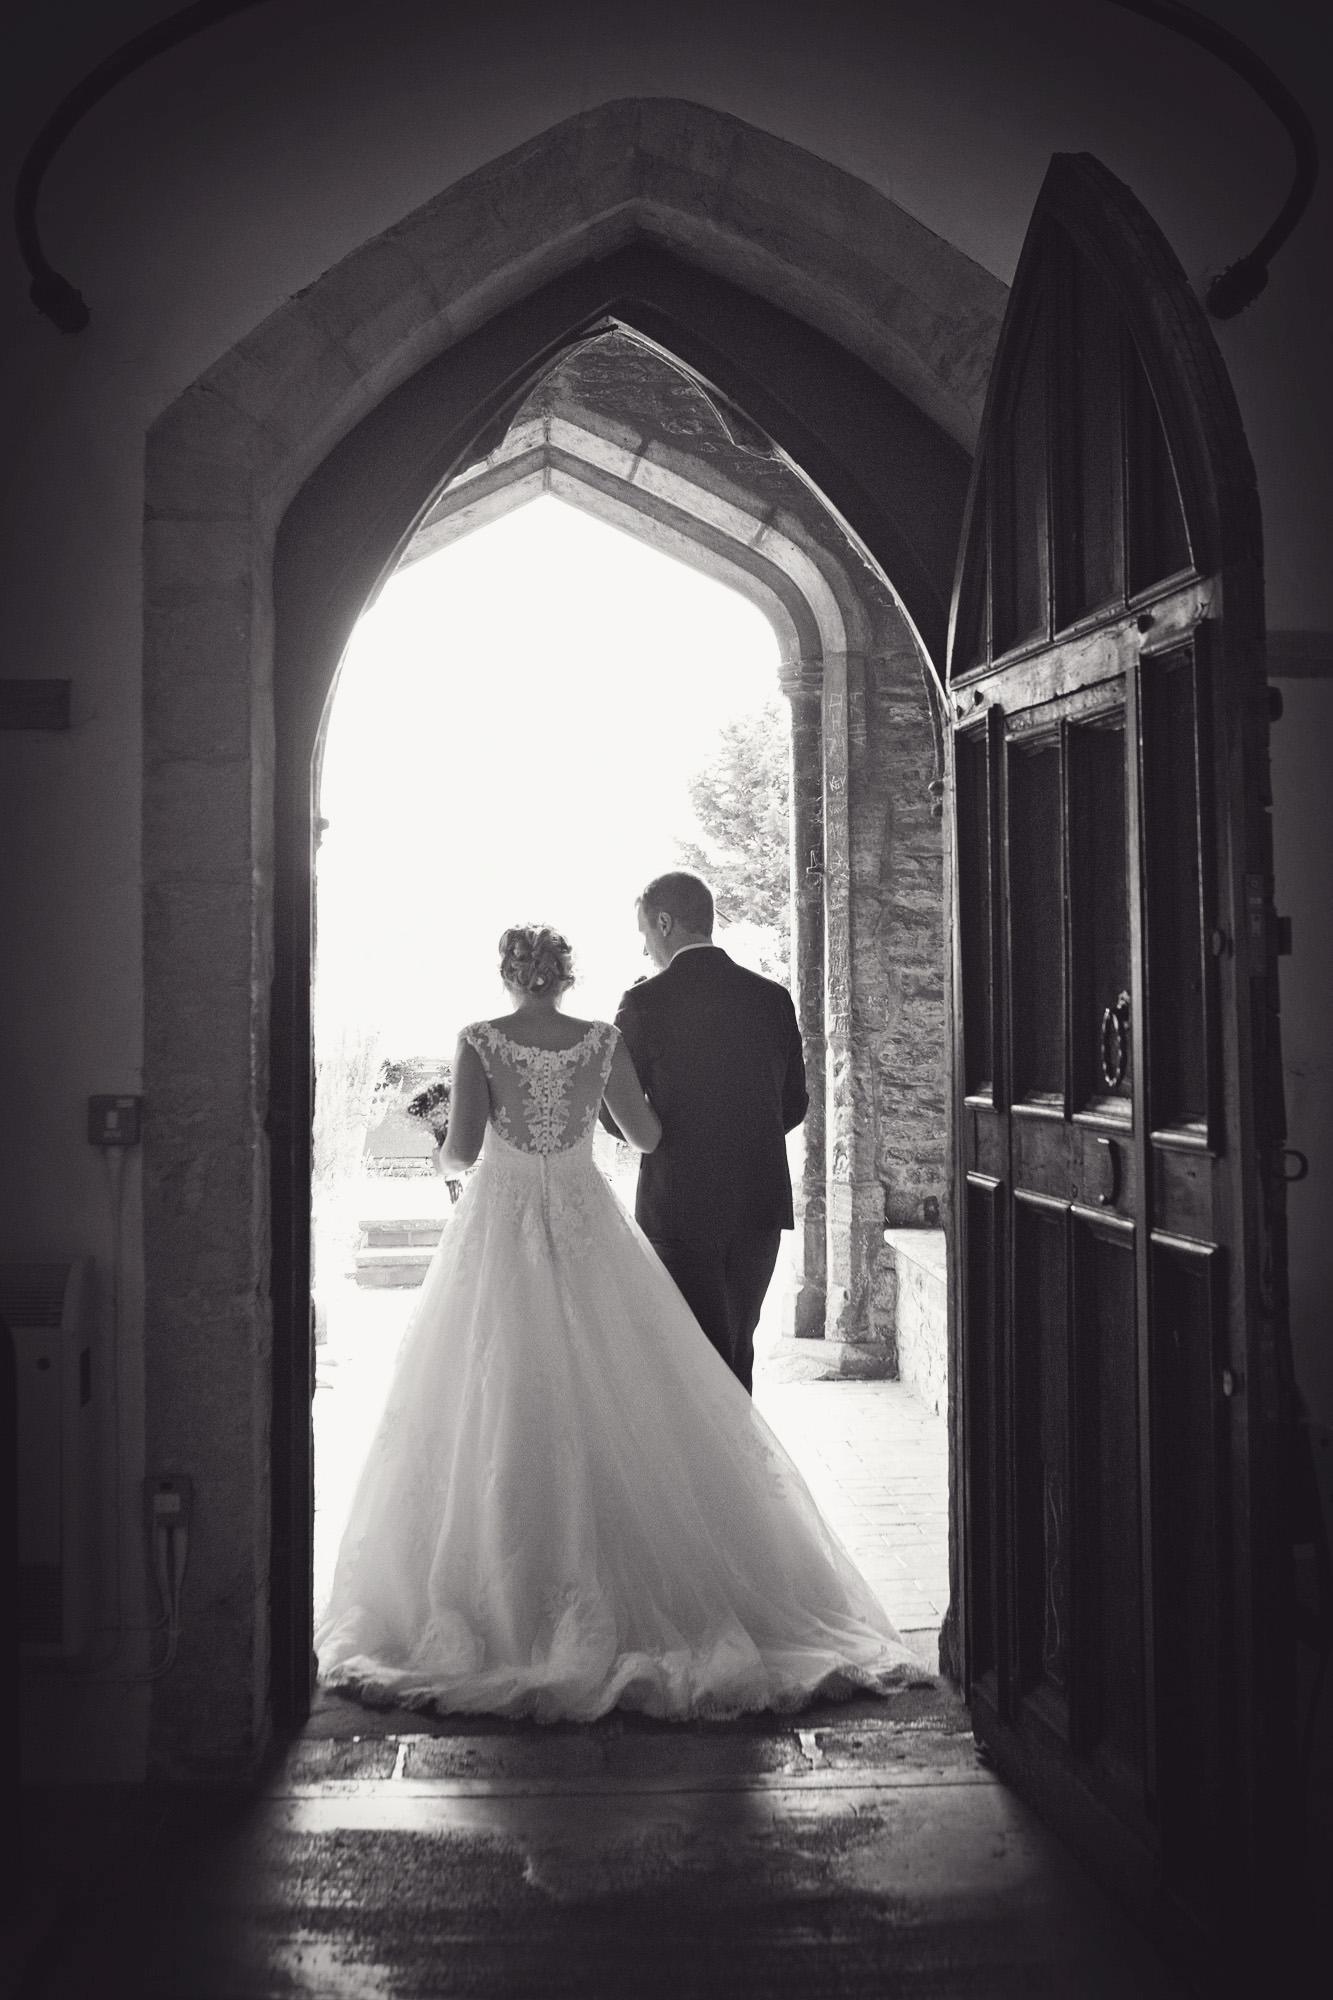 wedding-sibson-inn (17).jpg